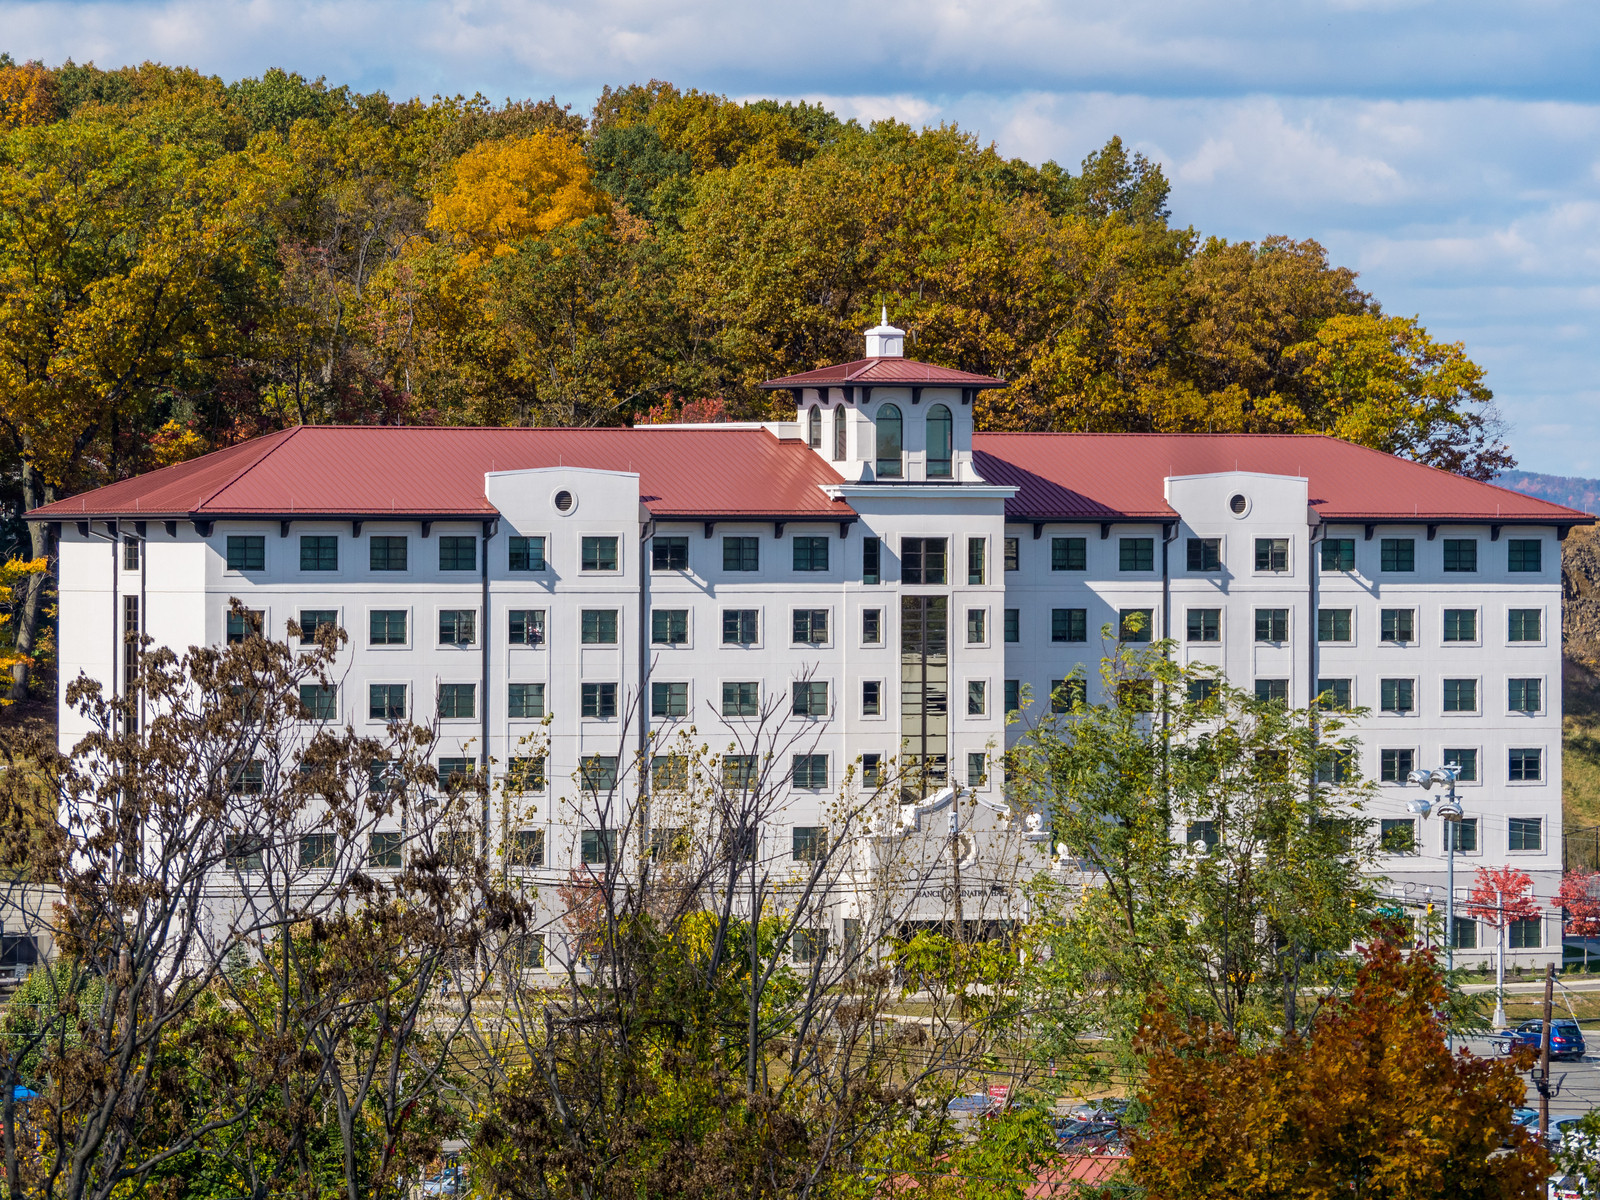 Sinatra Hall Student Housing